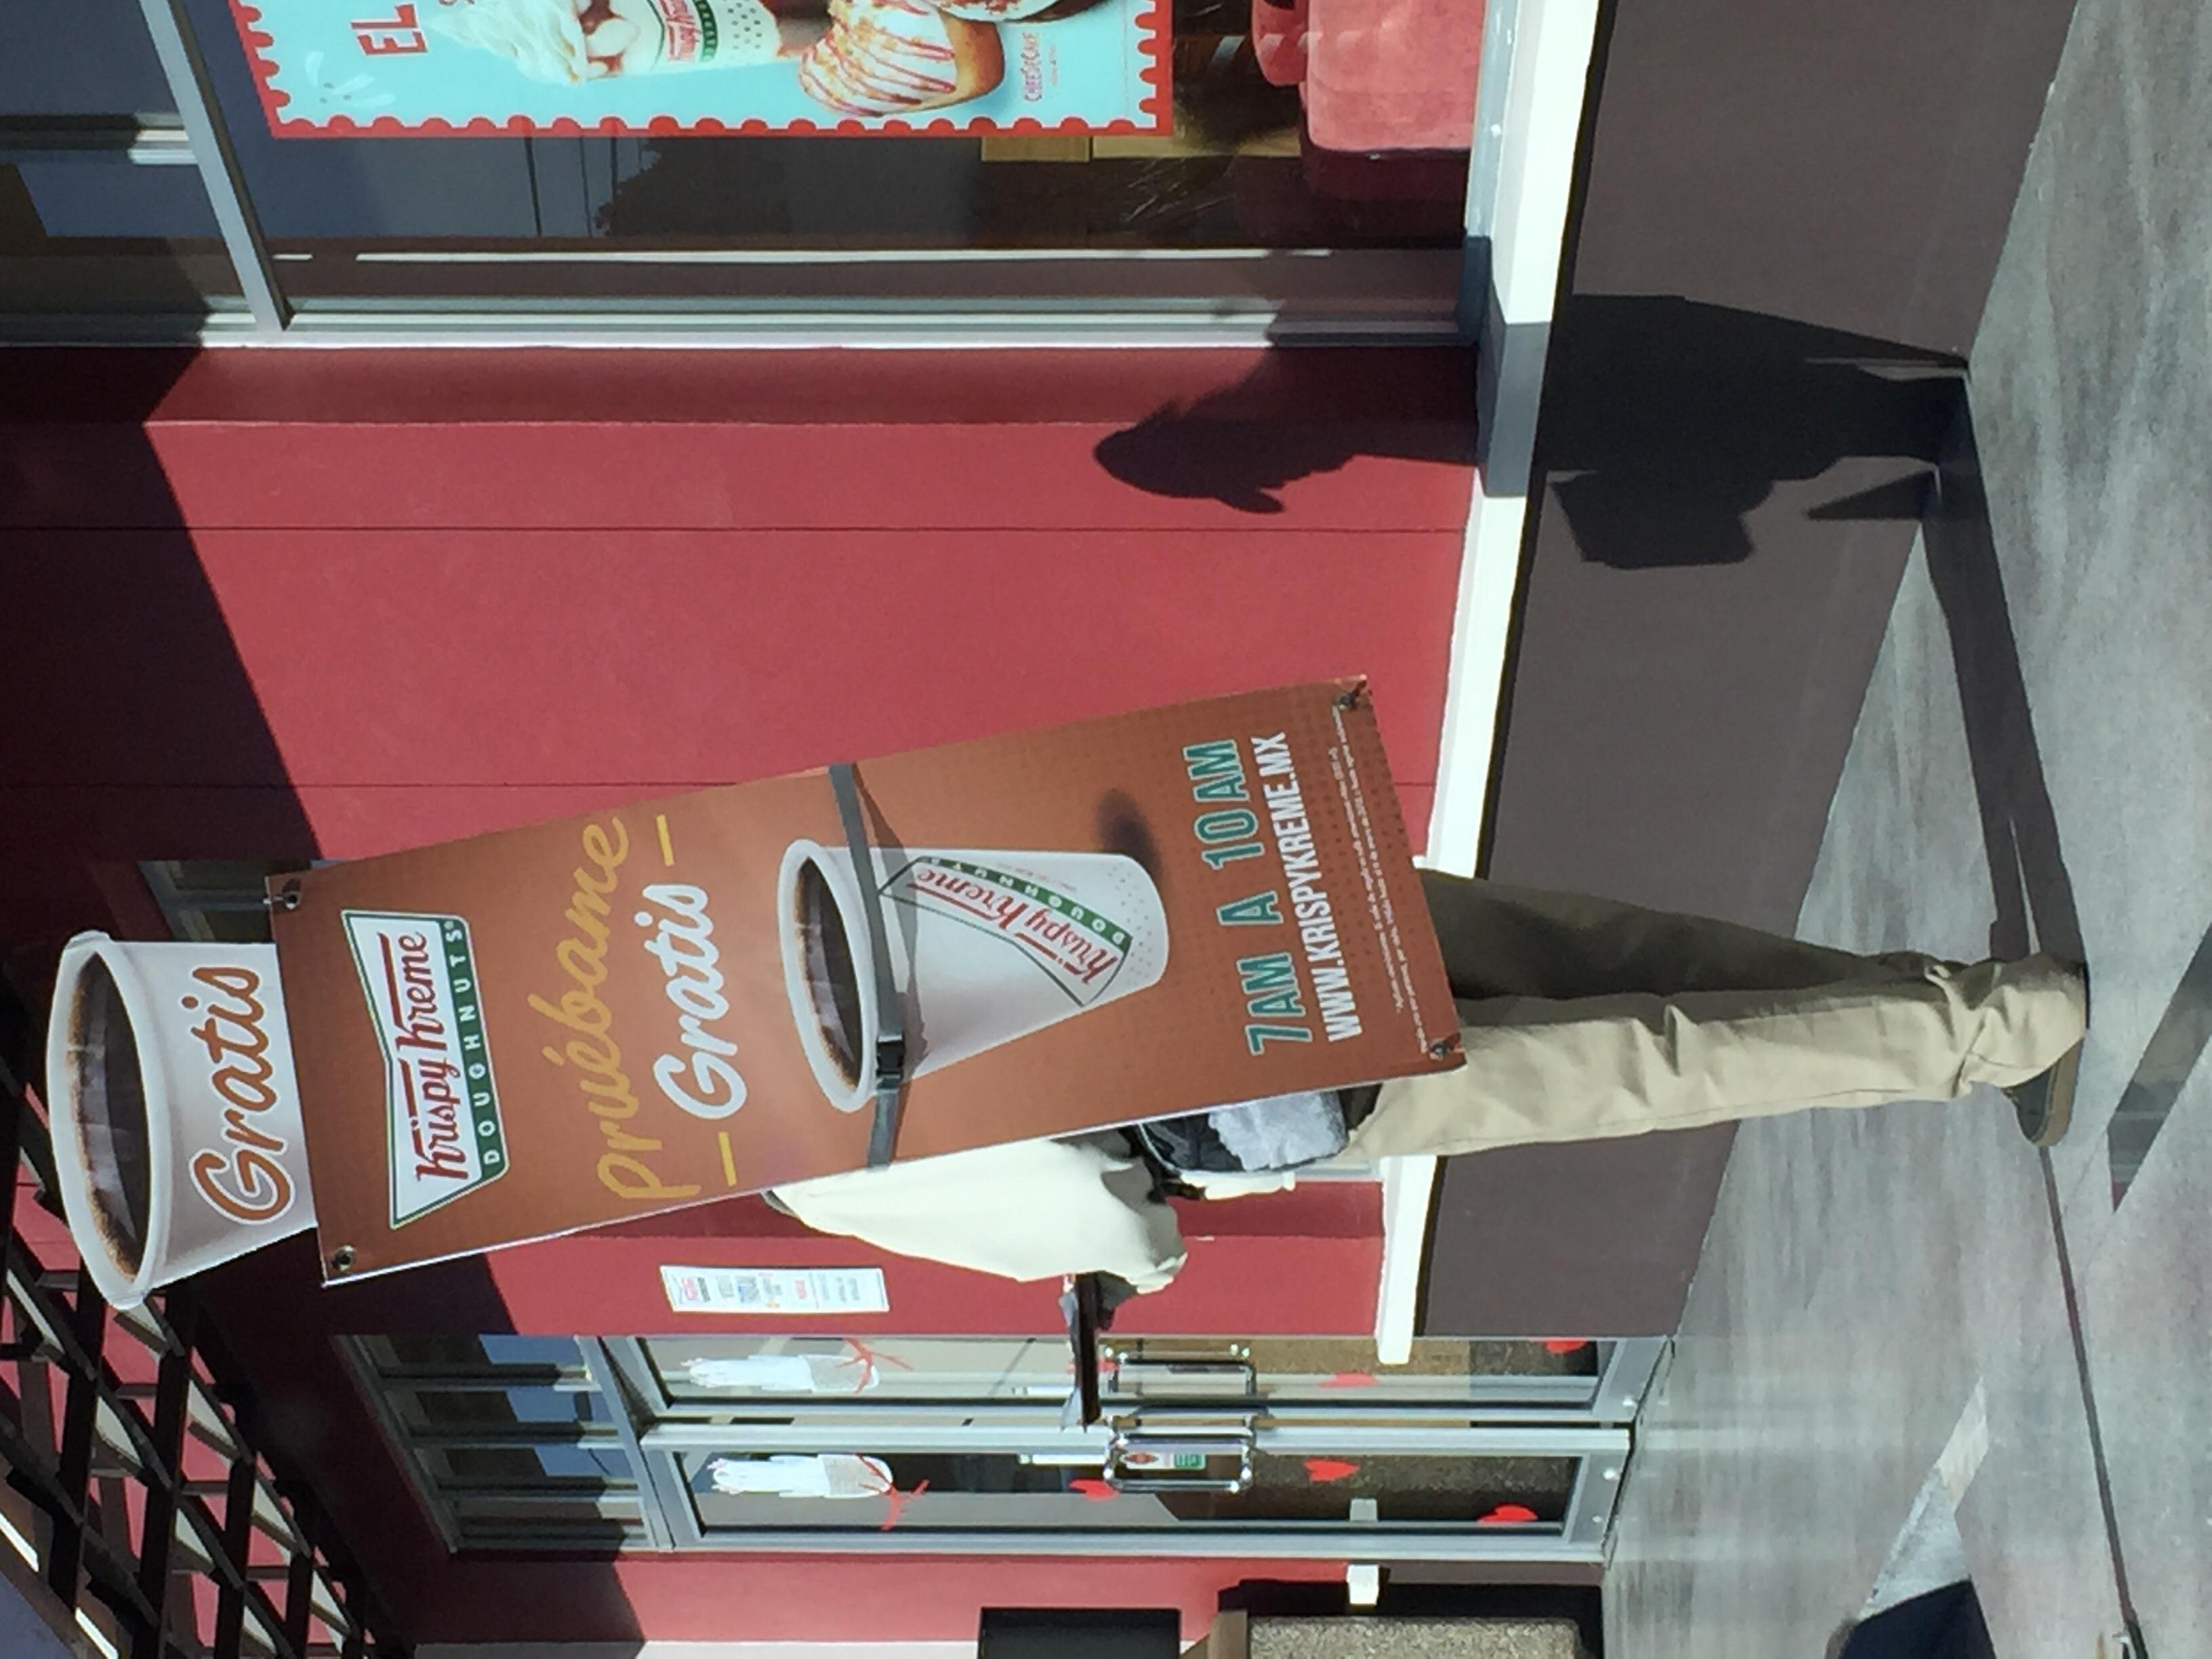 Krispy kreme: cafe americano gratis de 7am a 10 am